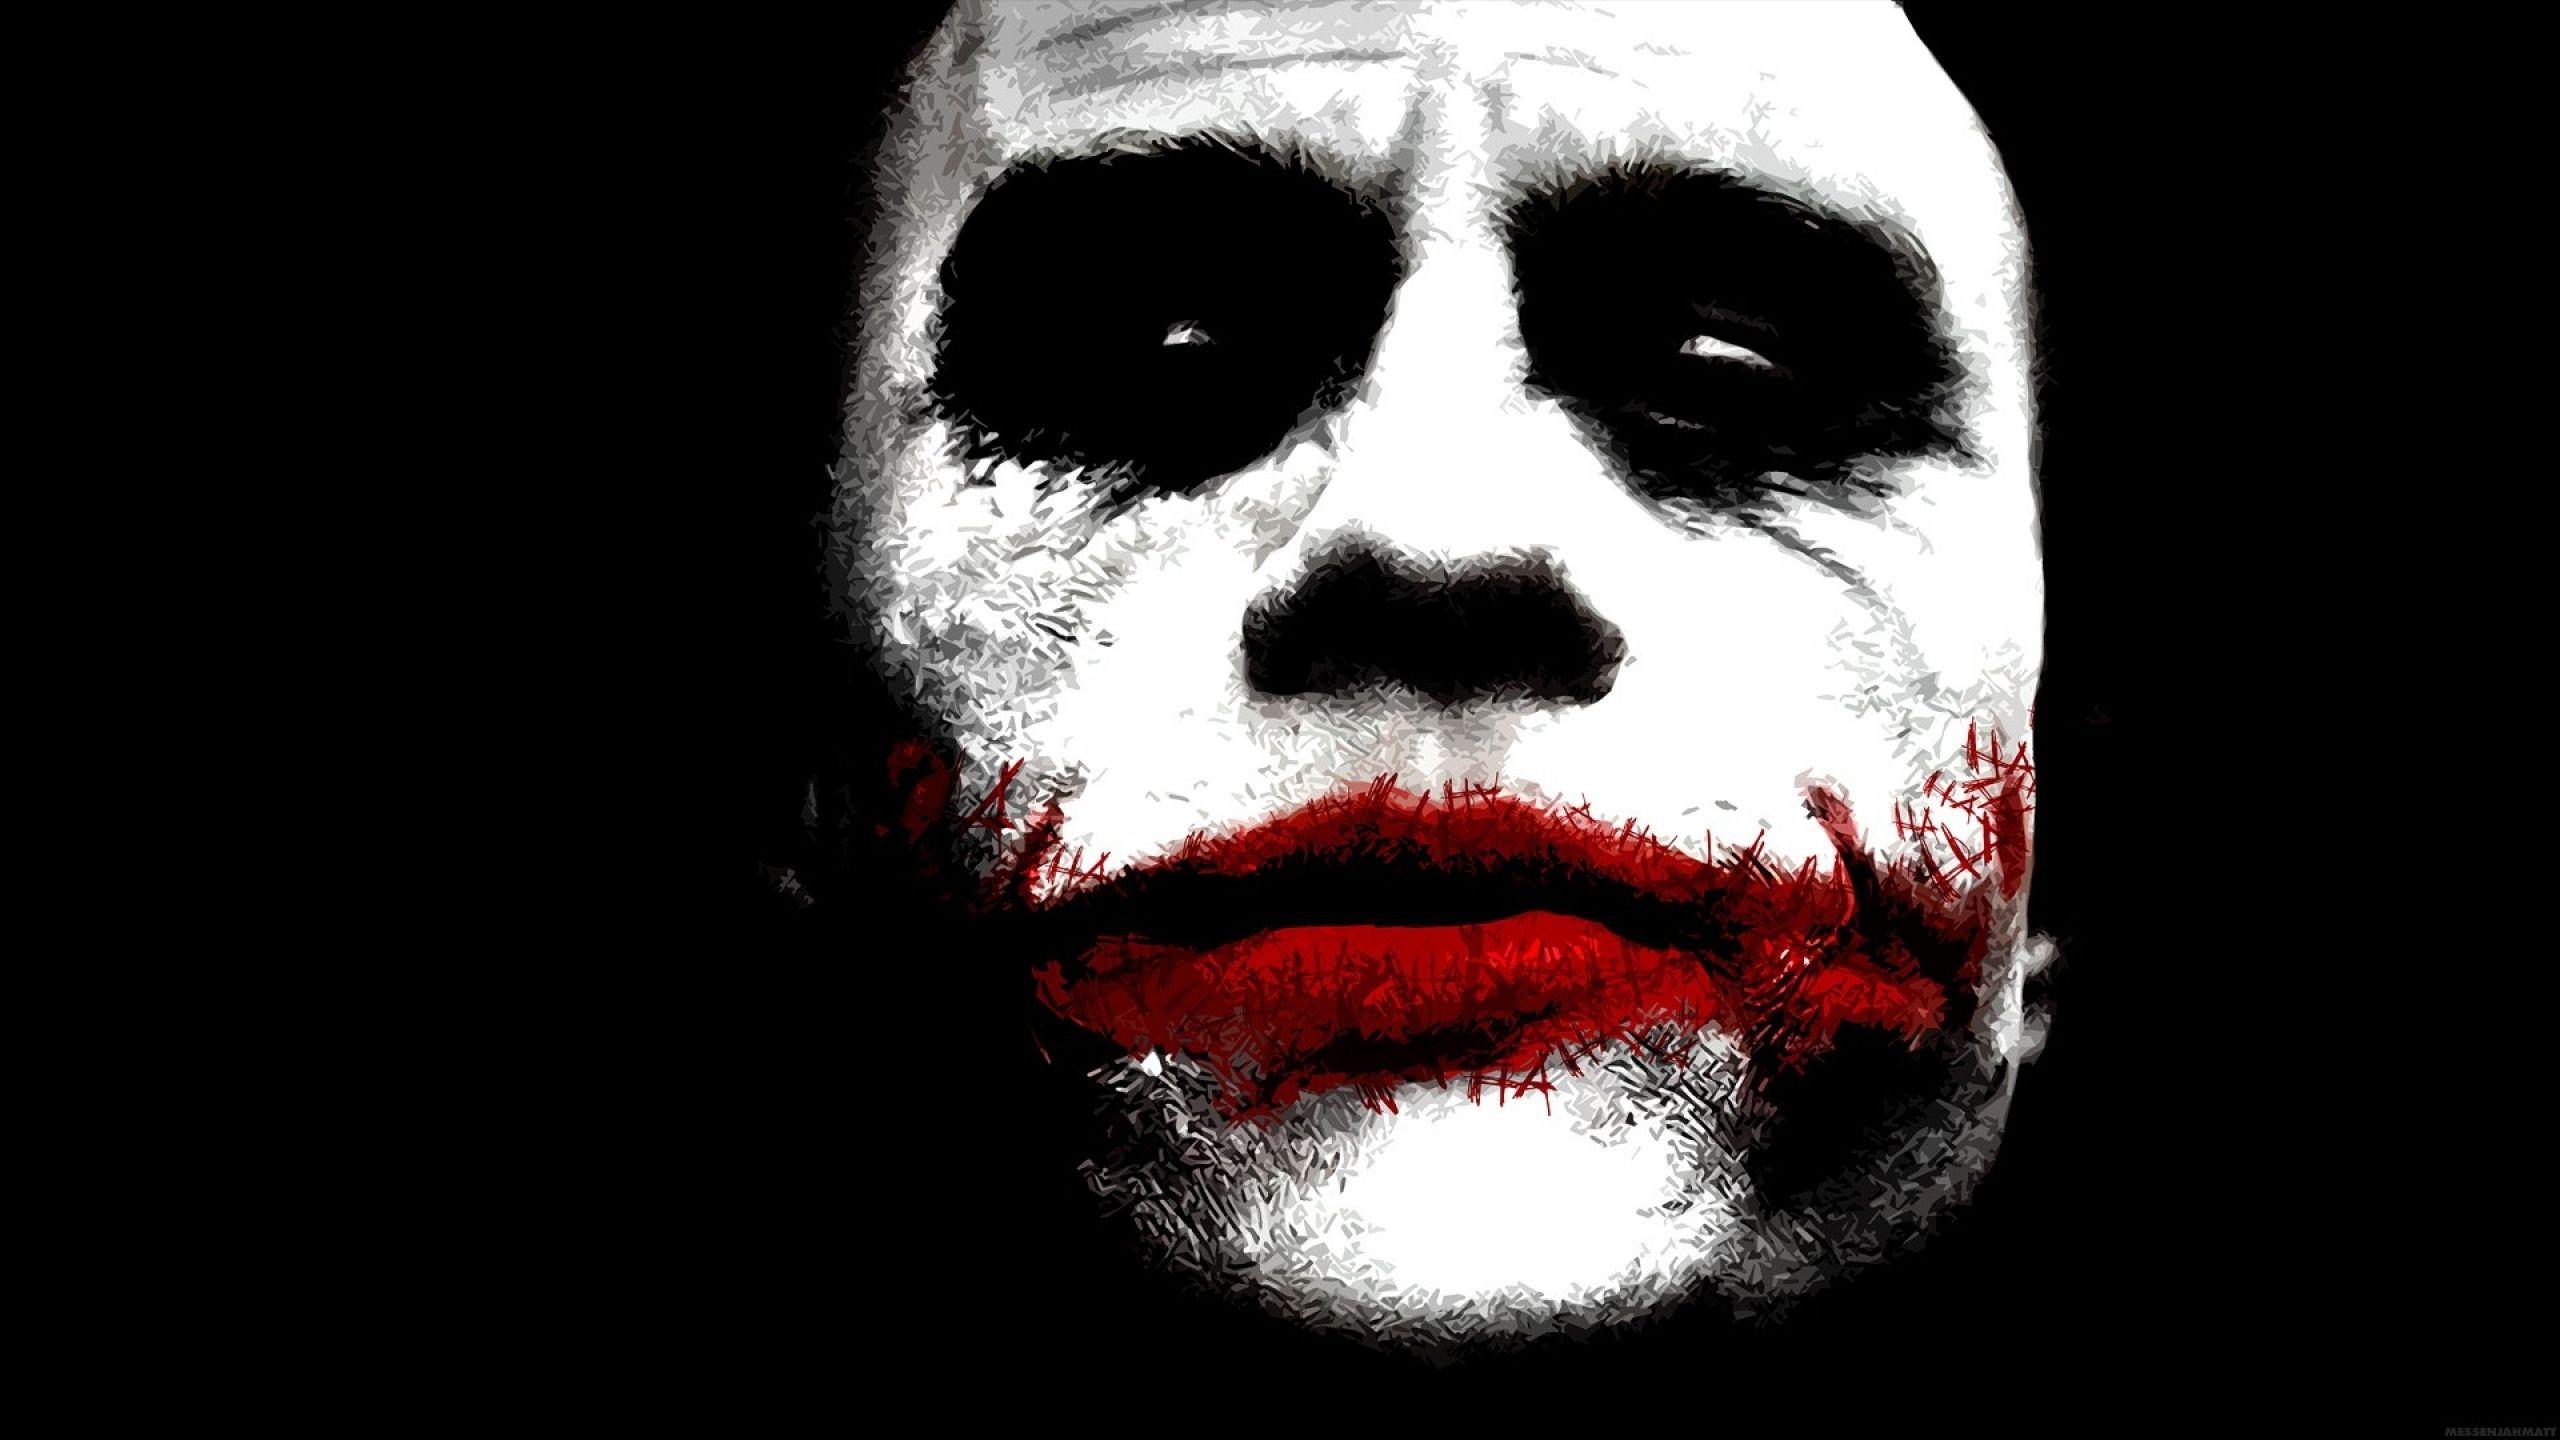 The Joker - The Dark Knight wallpaper   Joker wallpapers ...